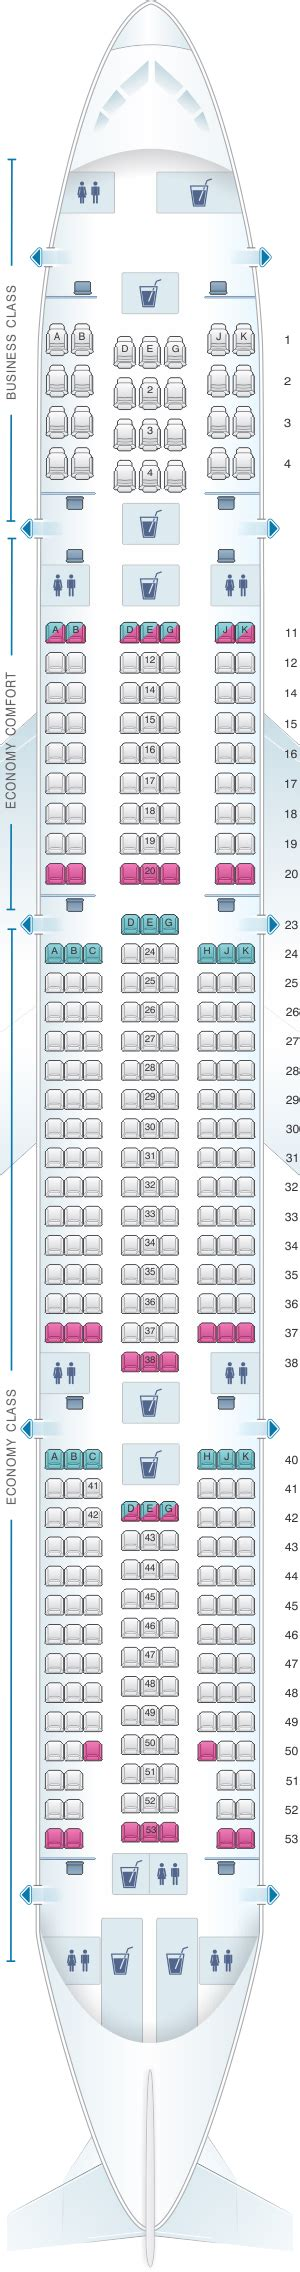 plan si es boeing 777 300er air seat map airlines boeing b777 300er seatmaestro com